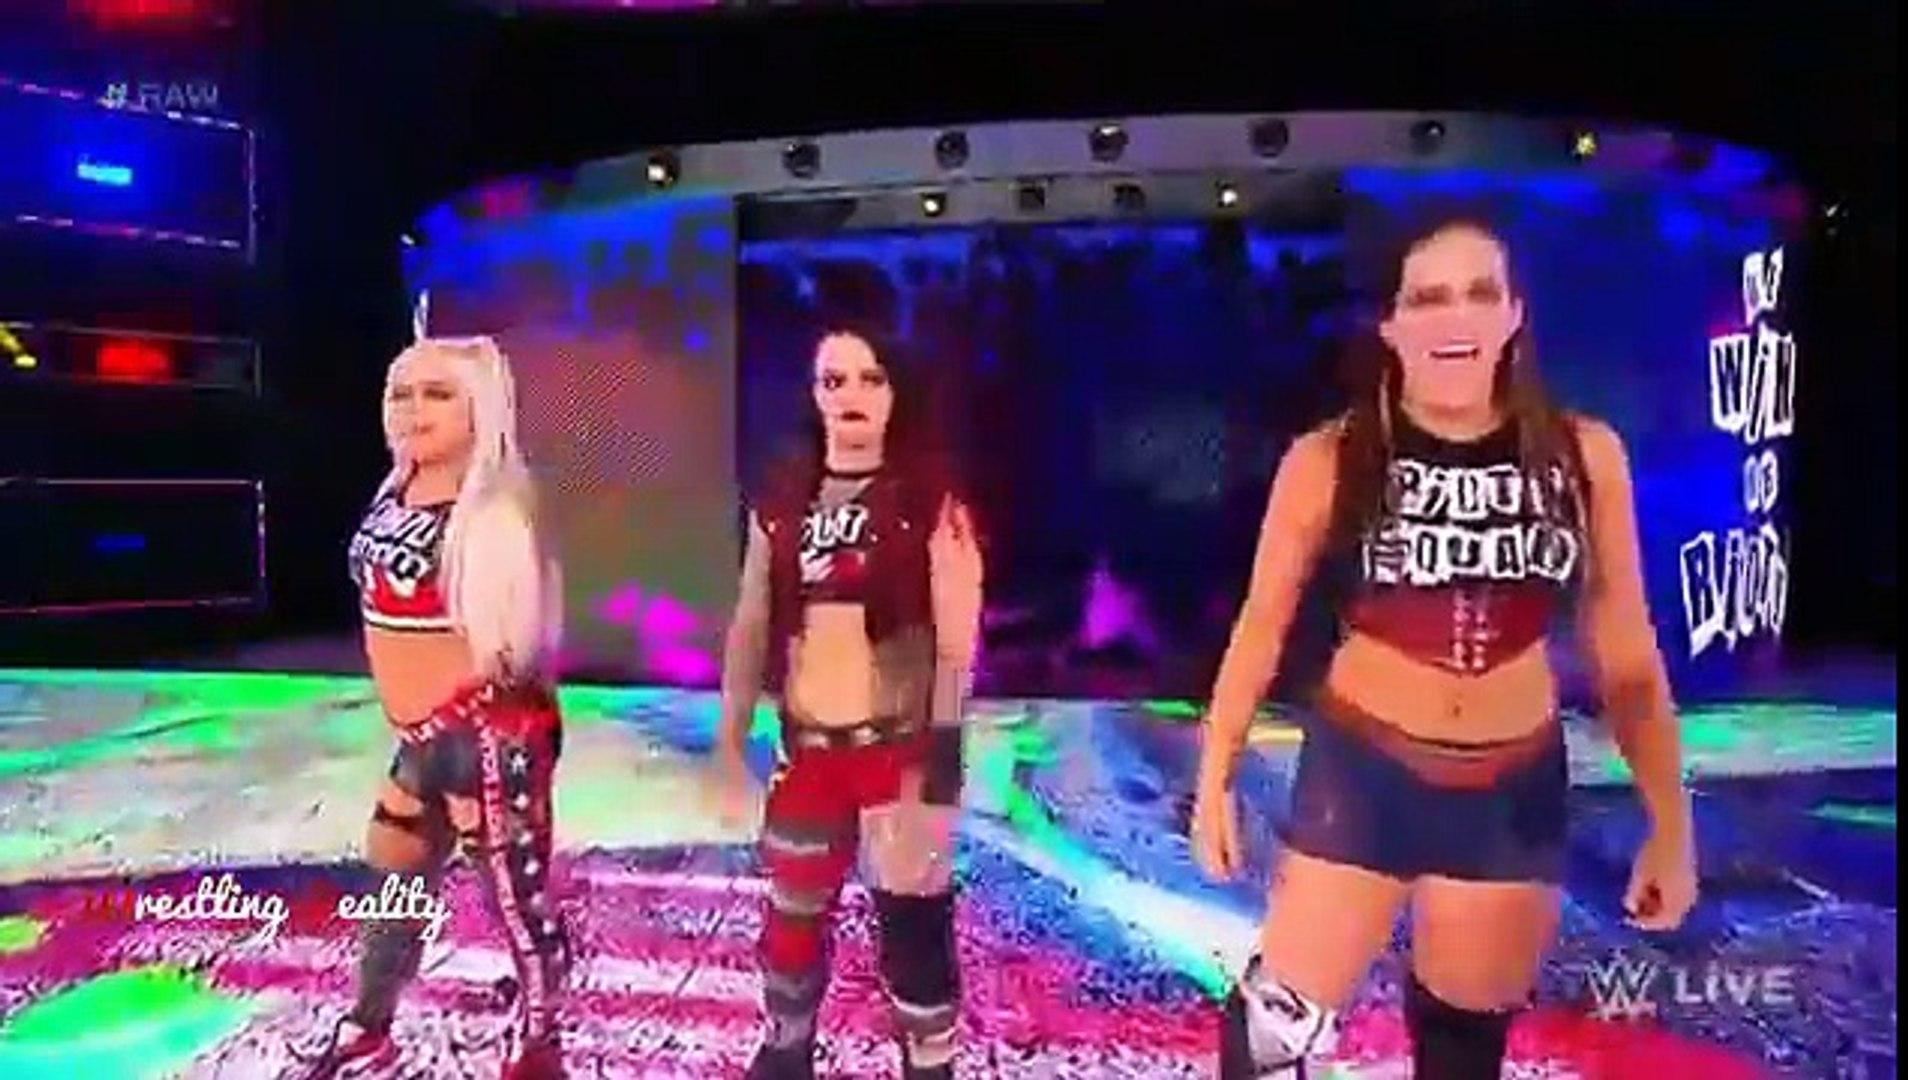 WWE Raw 20th August 2018 Highlights HD - WWE Raw 8-20-2018 Highlights HD(1)